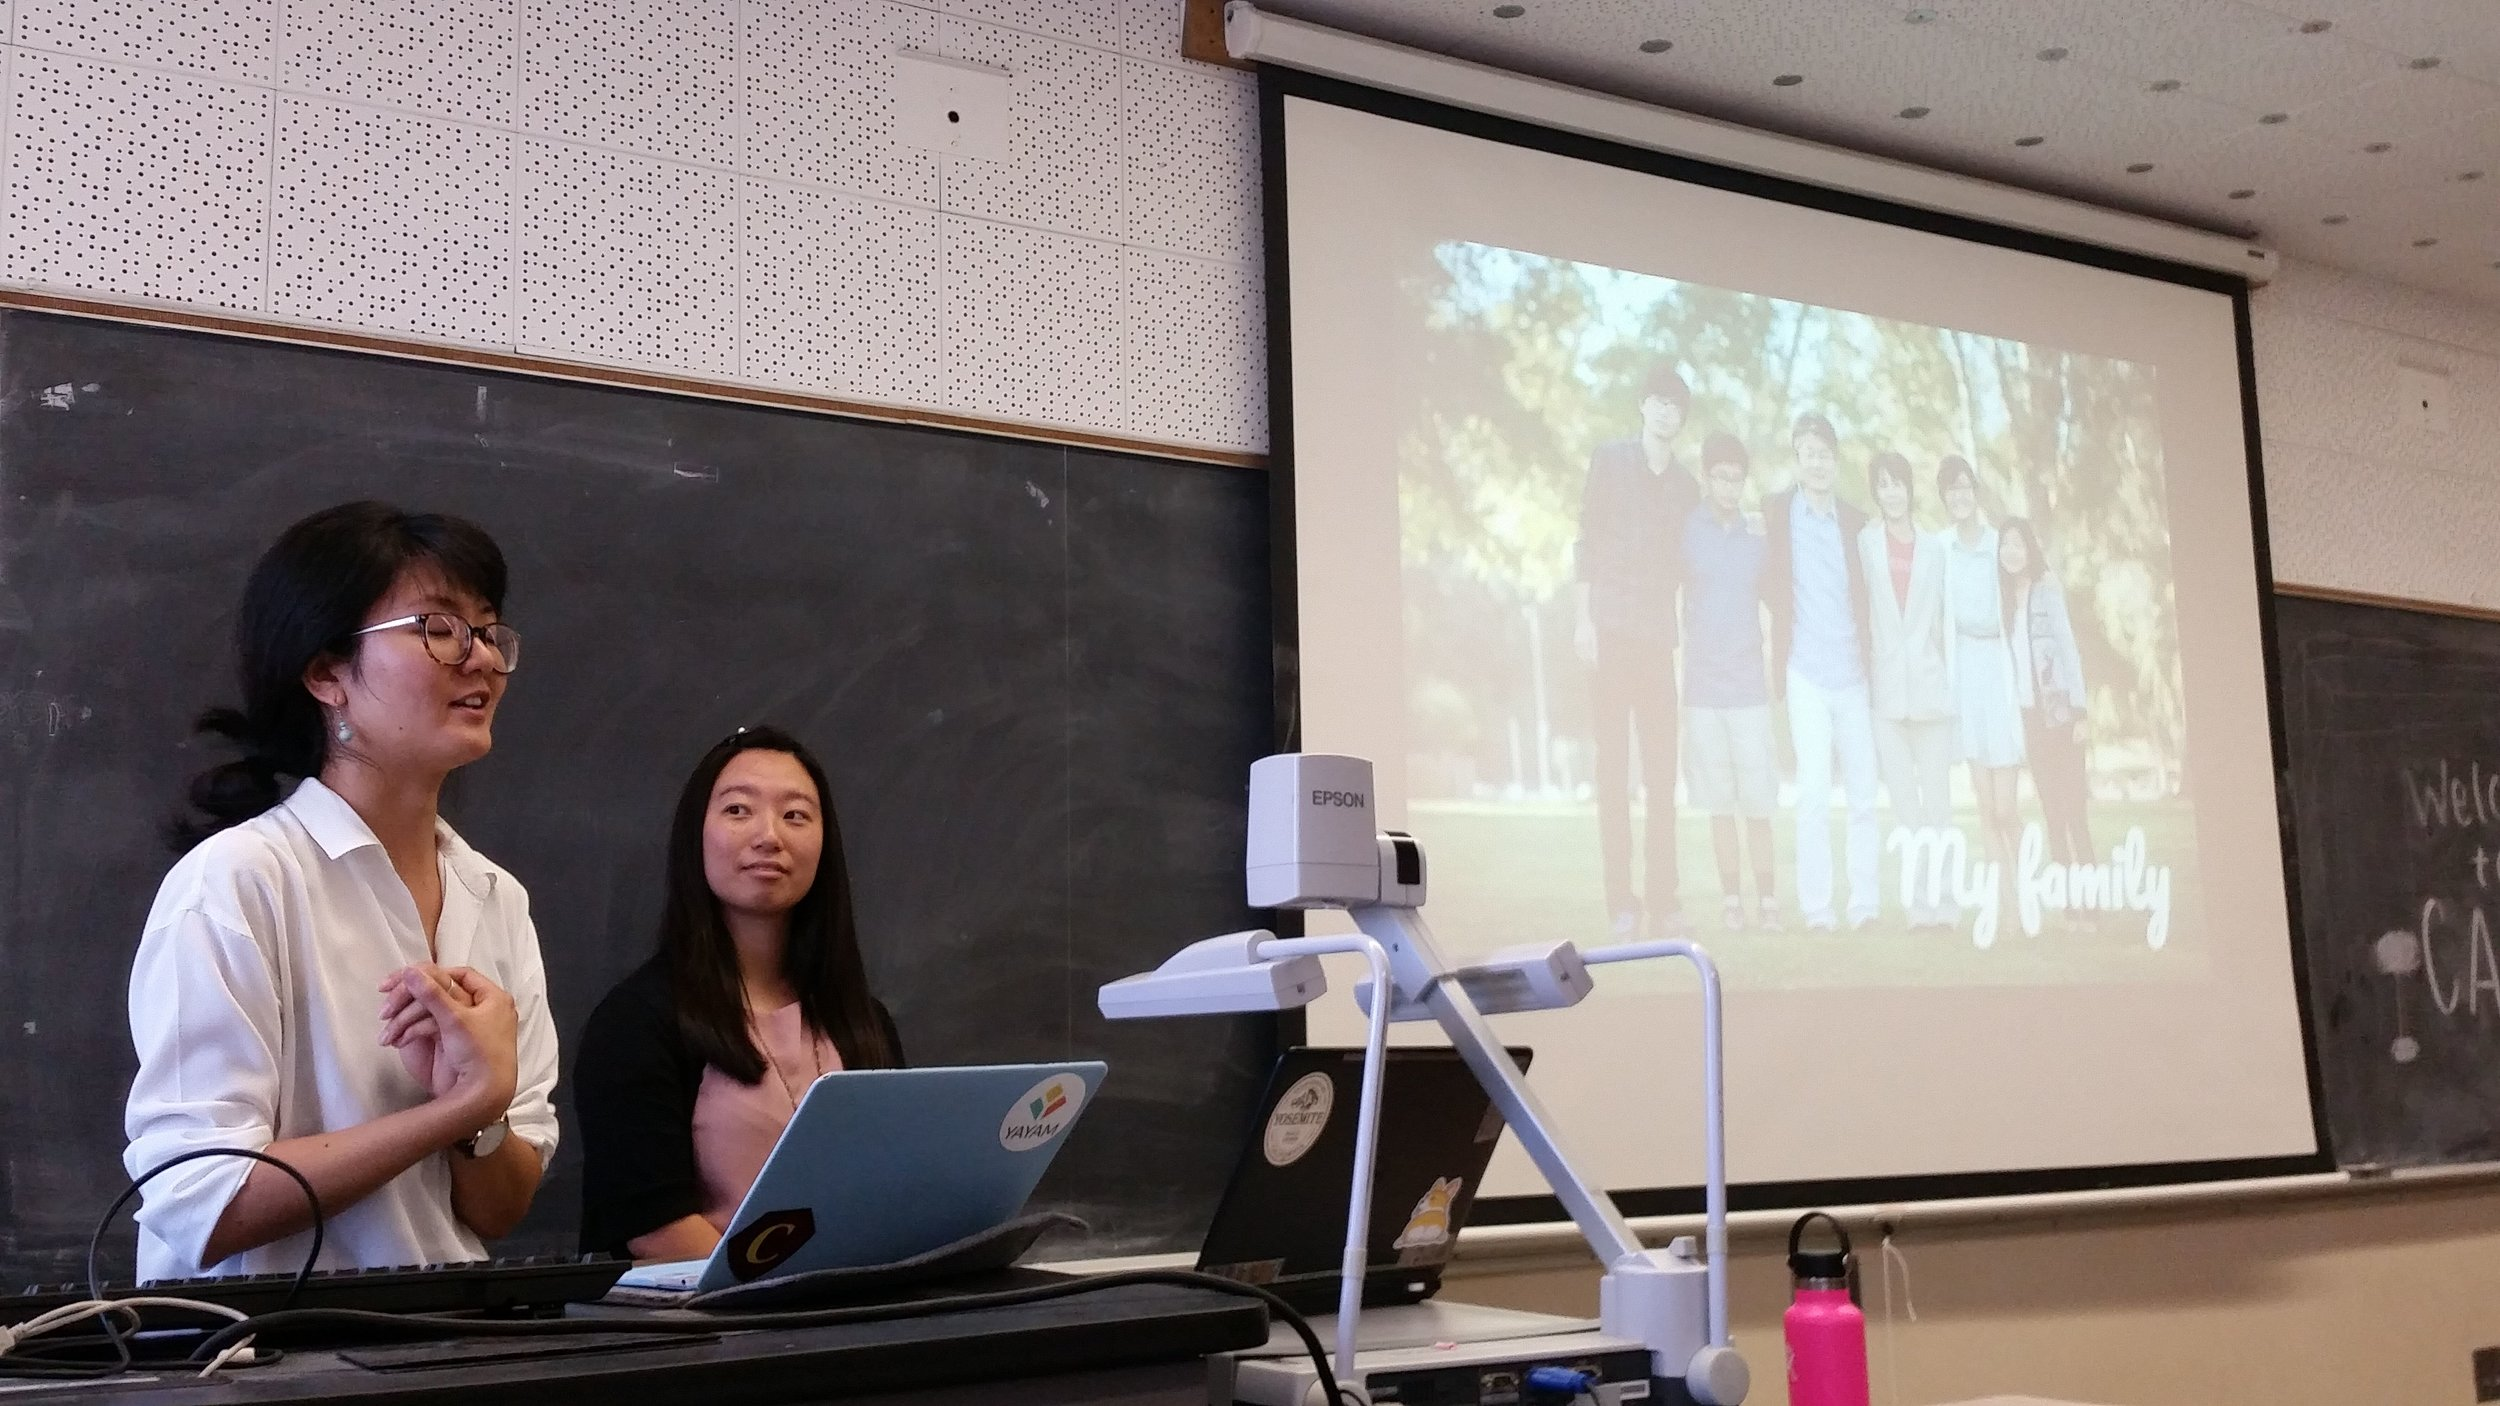 Satomi gives a CARP talk during a meeting.